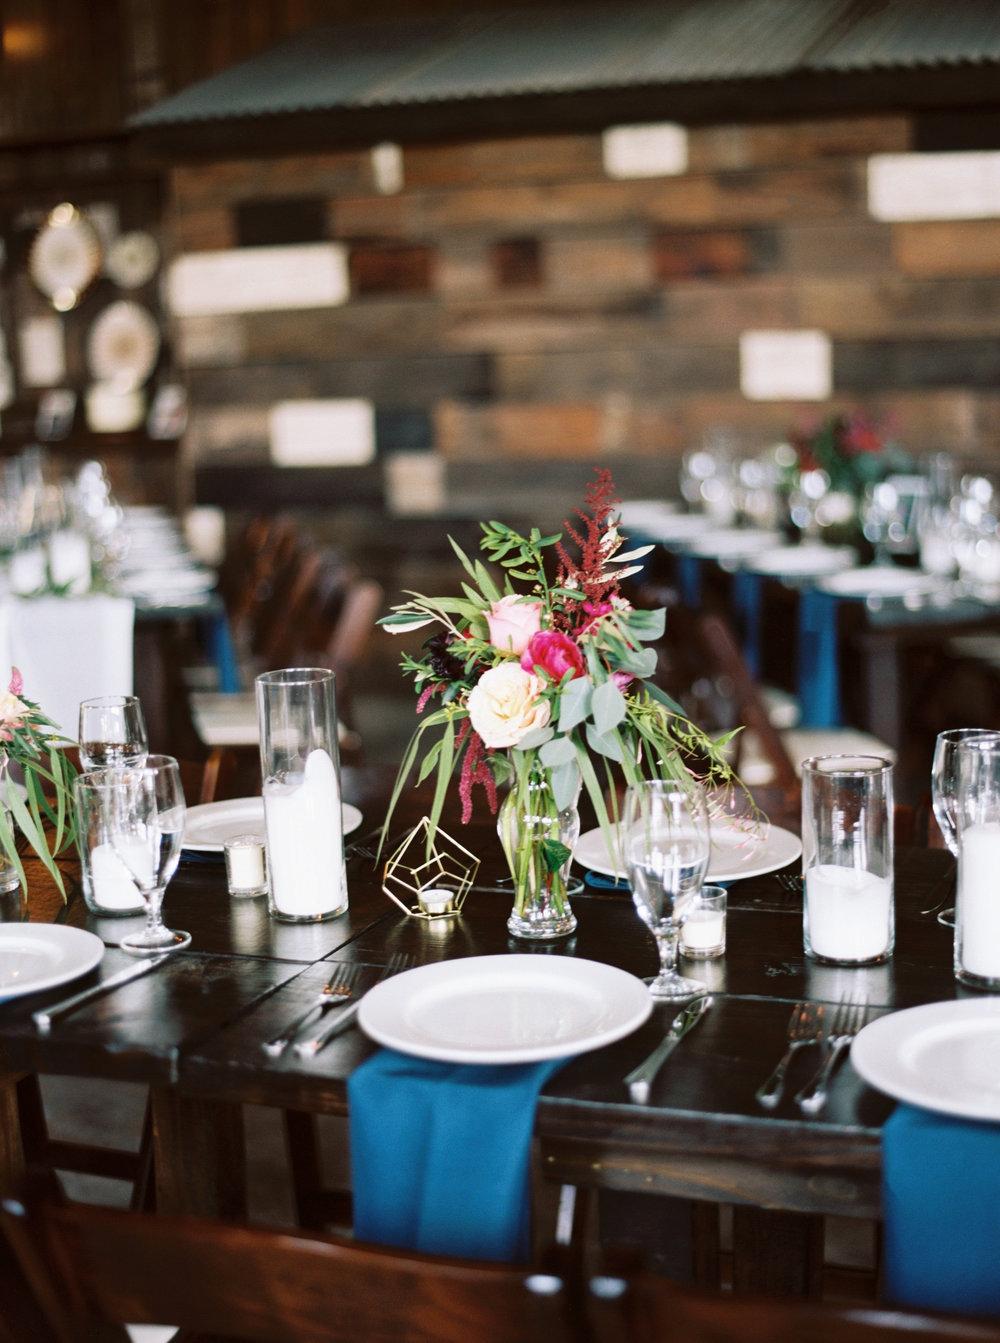 the-creek-haus-wedding-venue-austin-texas-wedding-destination-venue-with-lodging